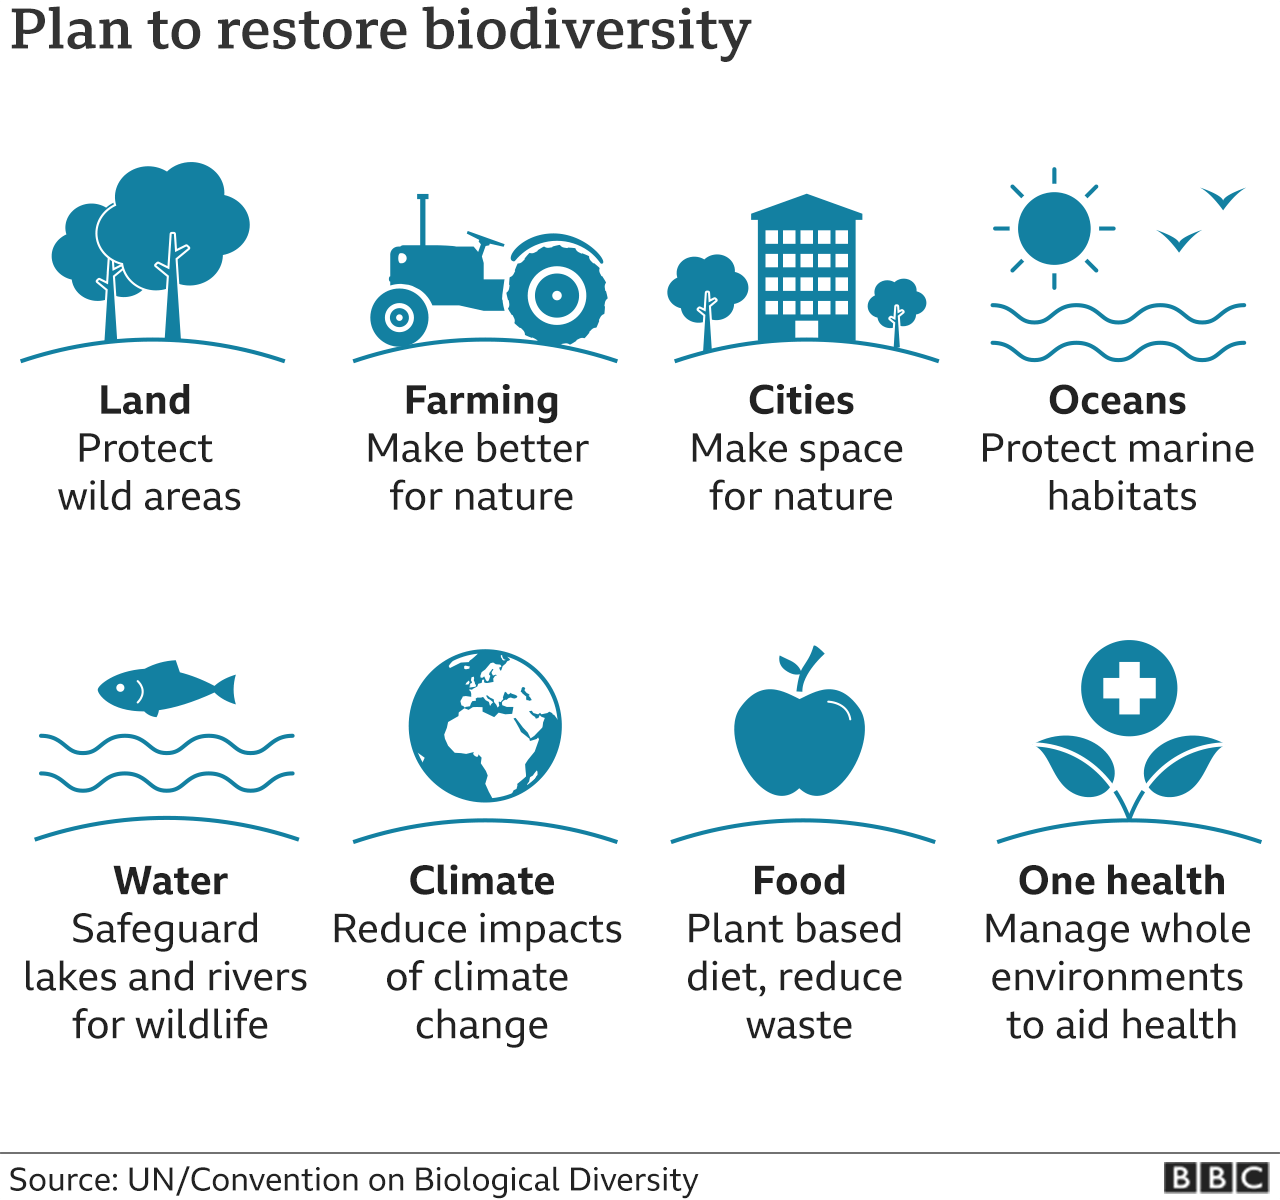 Plan to restore biodiversity